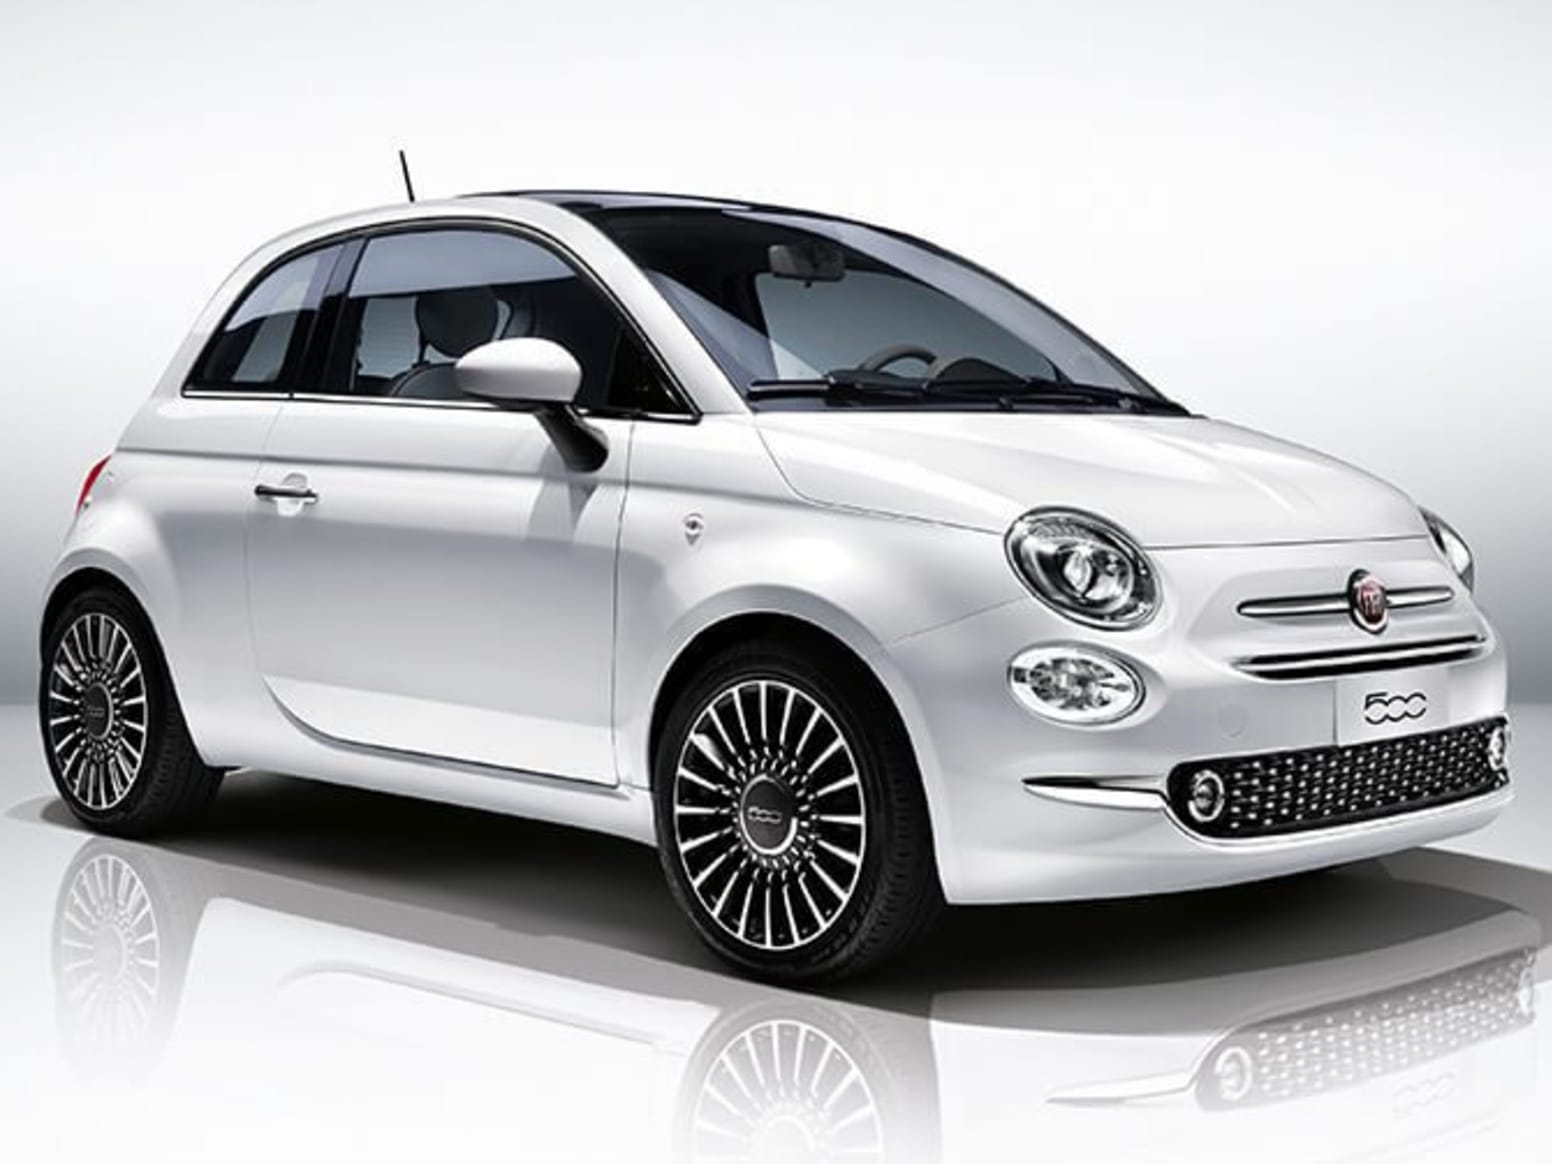 White Fiat 500 Front